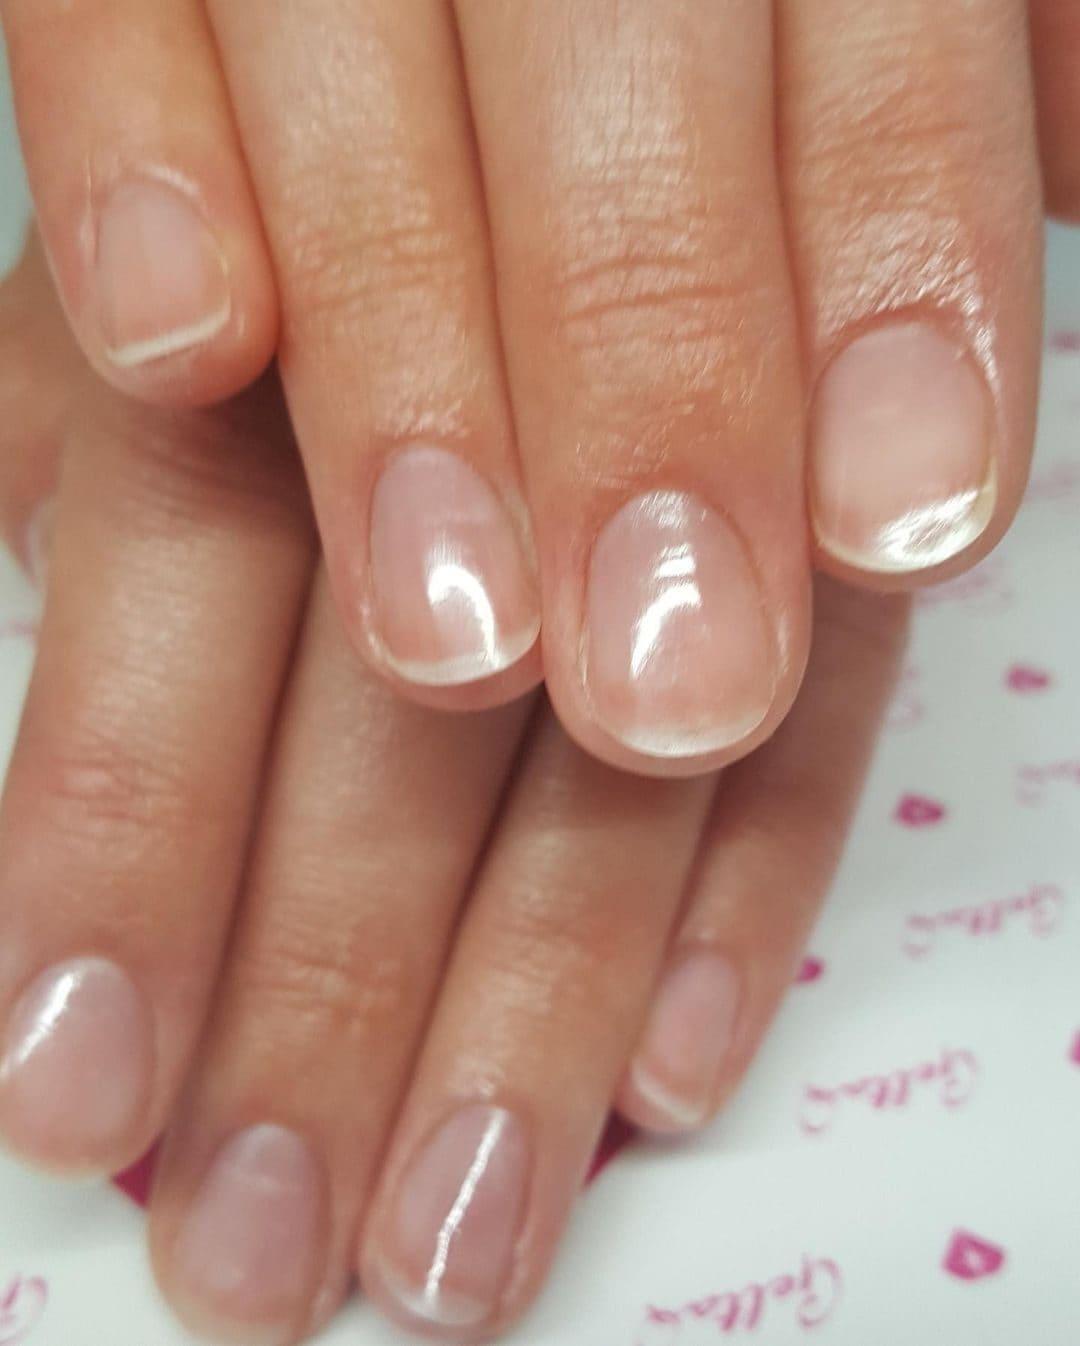 La manicure giapponese è naturale